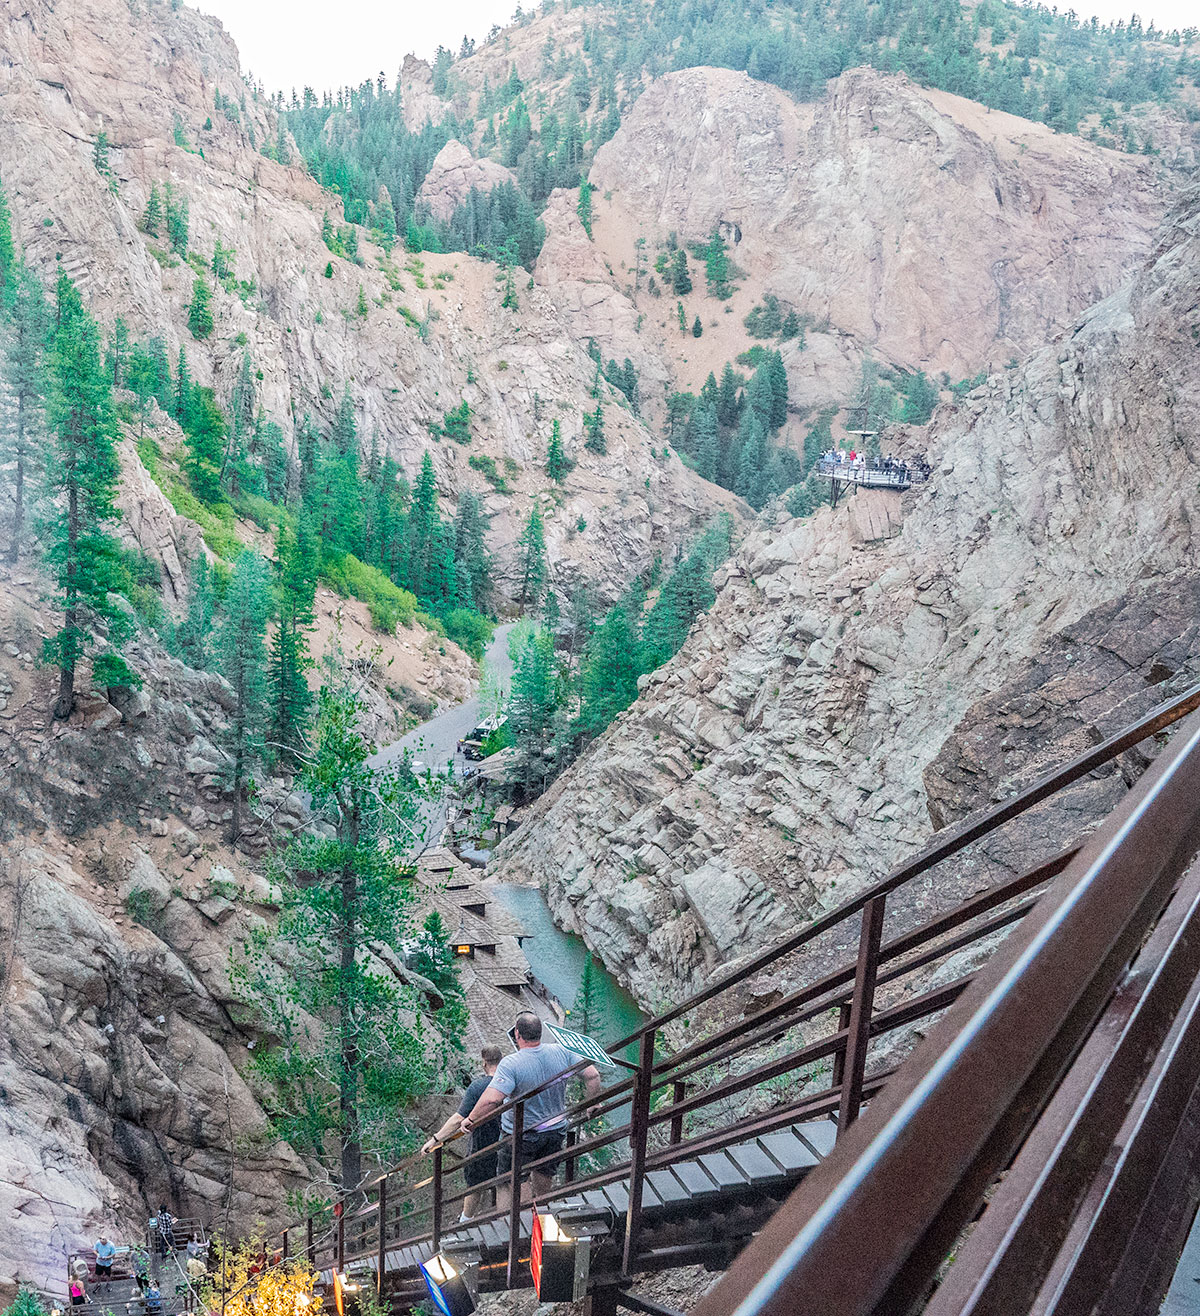 The-Steep-Stair-Climb-Colorado-Springs-Seven-Falls